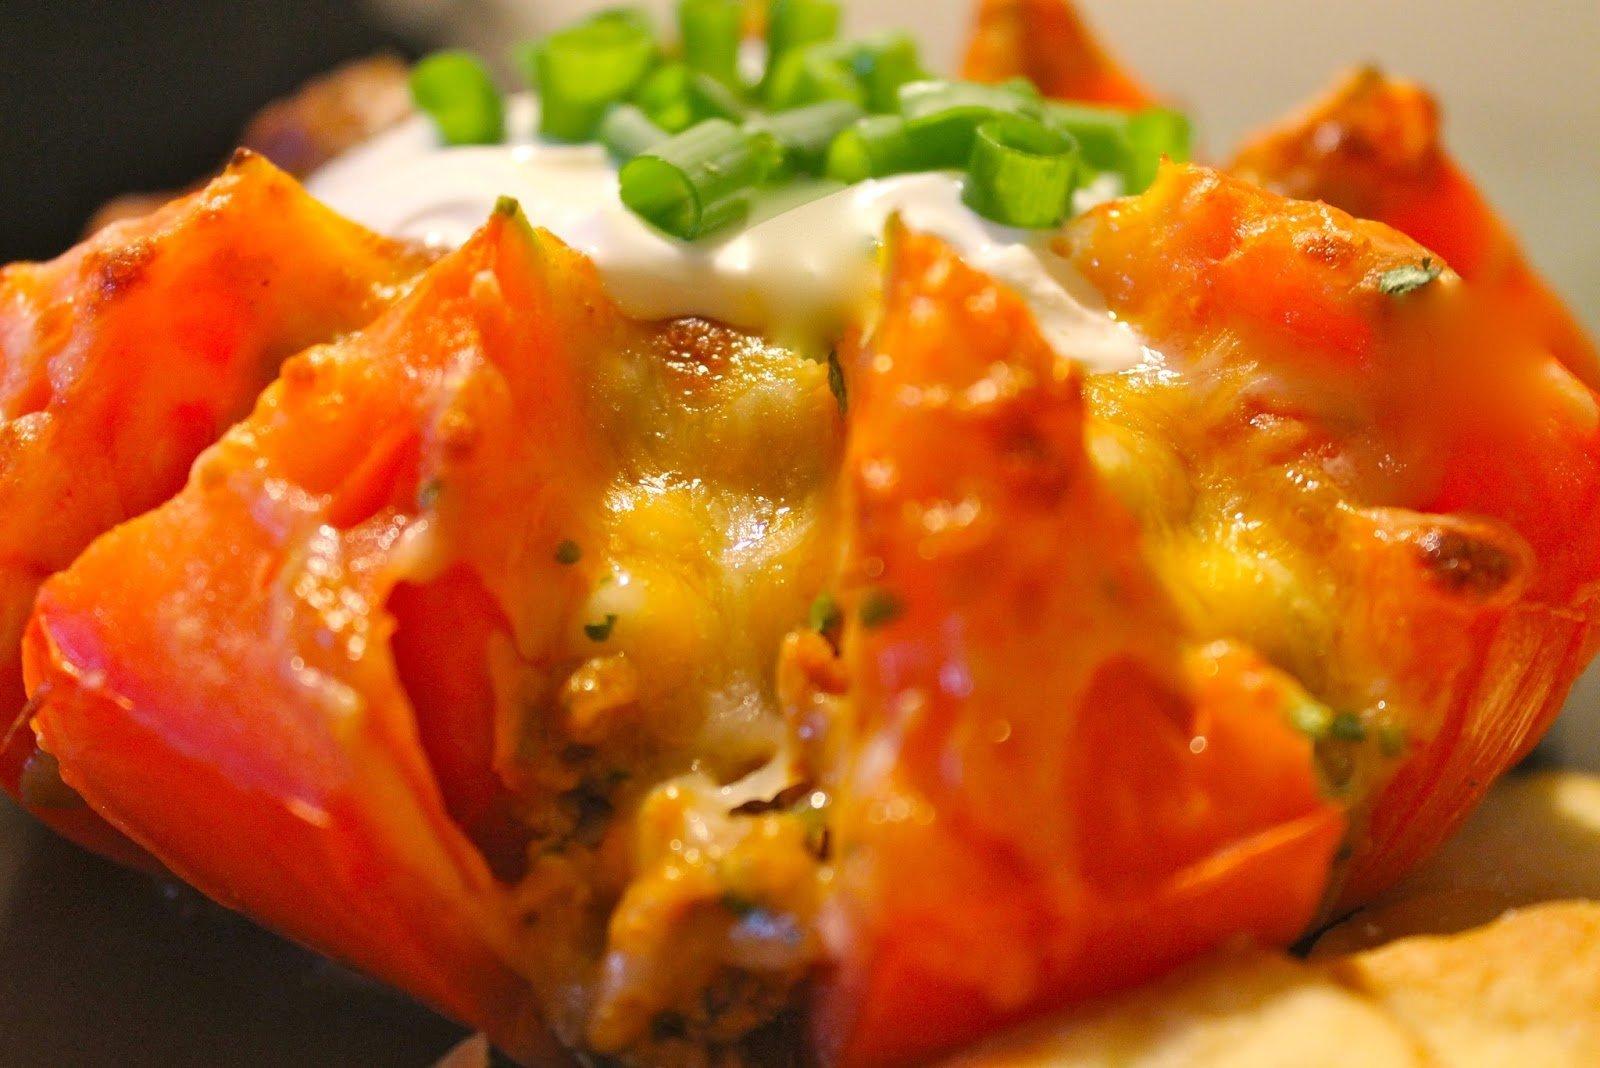 Let's Cook: Oven-Roasted Tomato Burrito